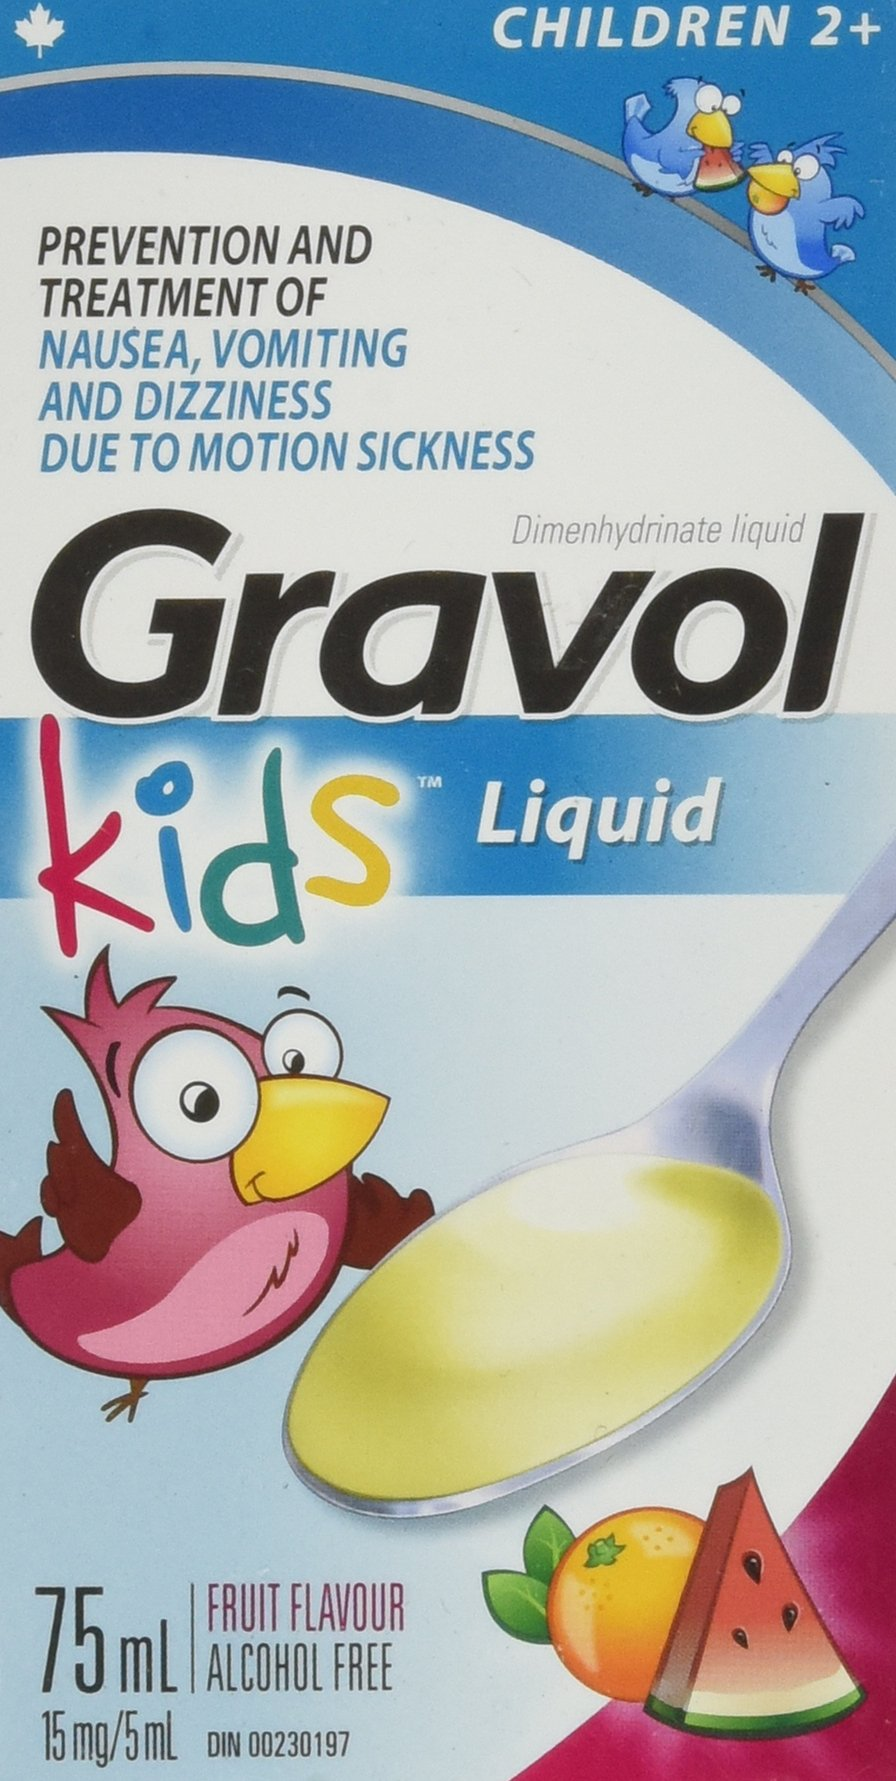 Children's Liquid GRAVOL for NAUSEA, VOMITING, DIZZINESS & MOTION SICKNESS Ages 2+ (75ml size) by Gravol